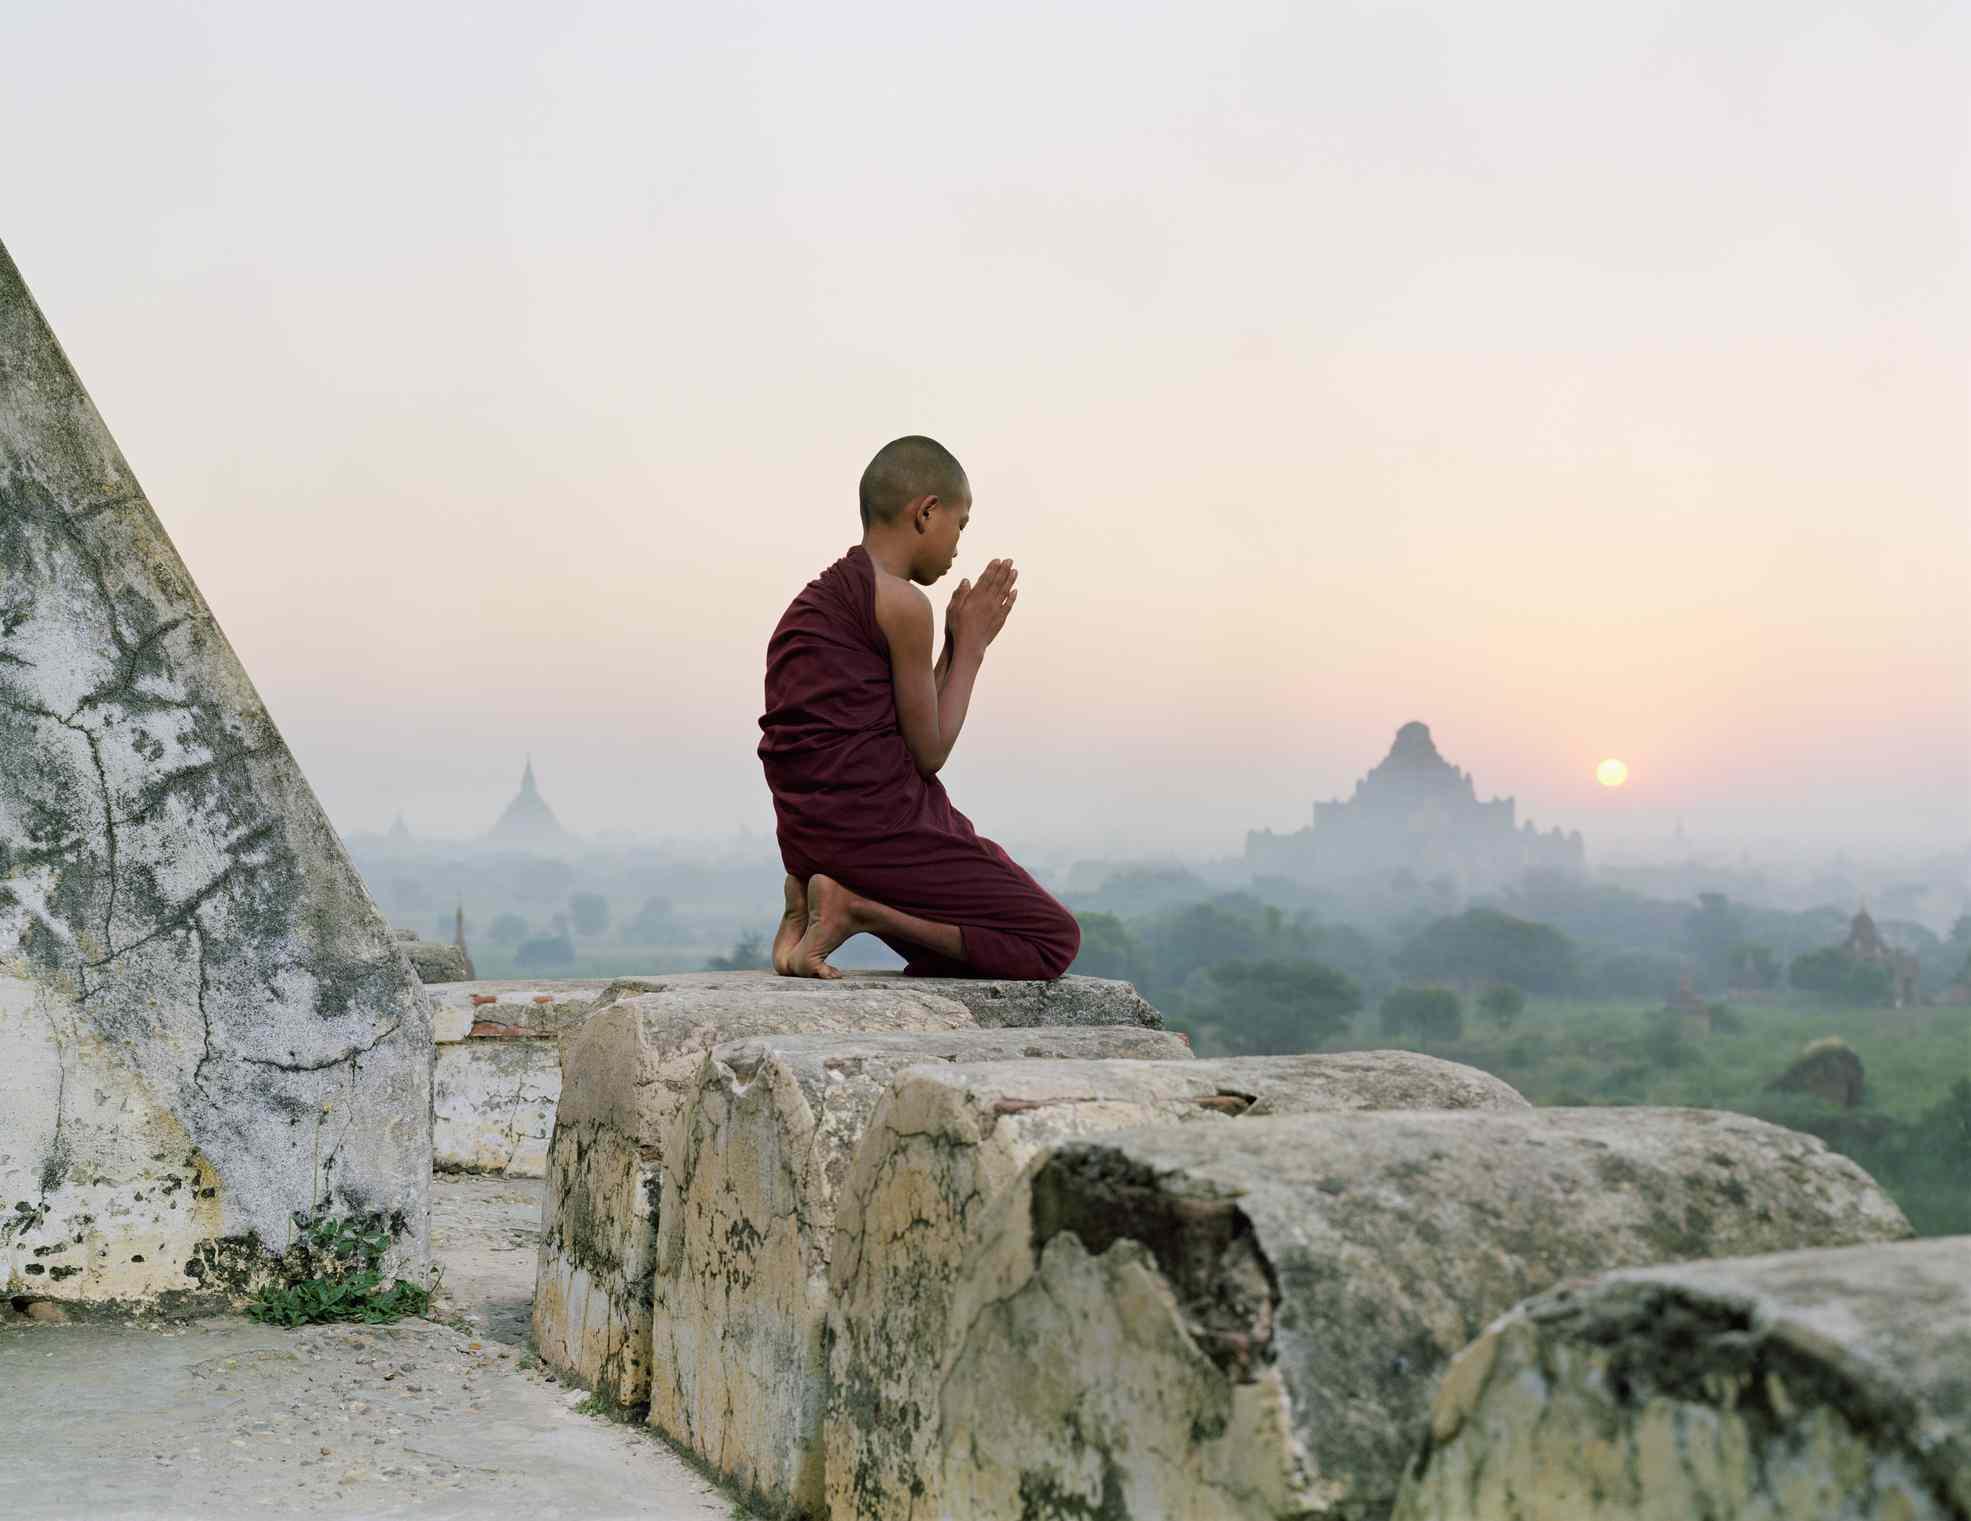 Buddhist monk praying on temple